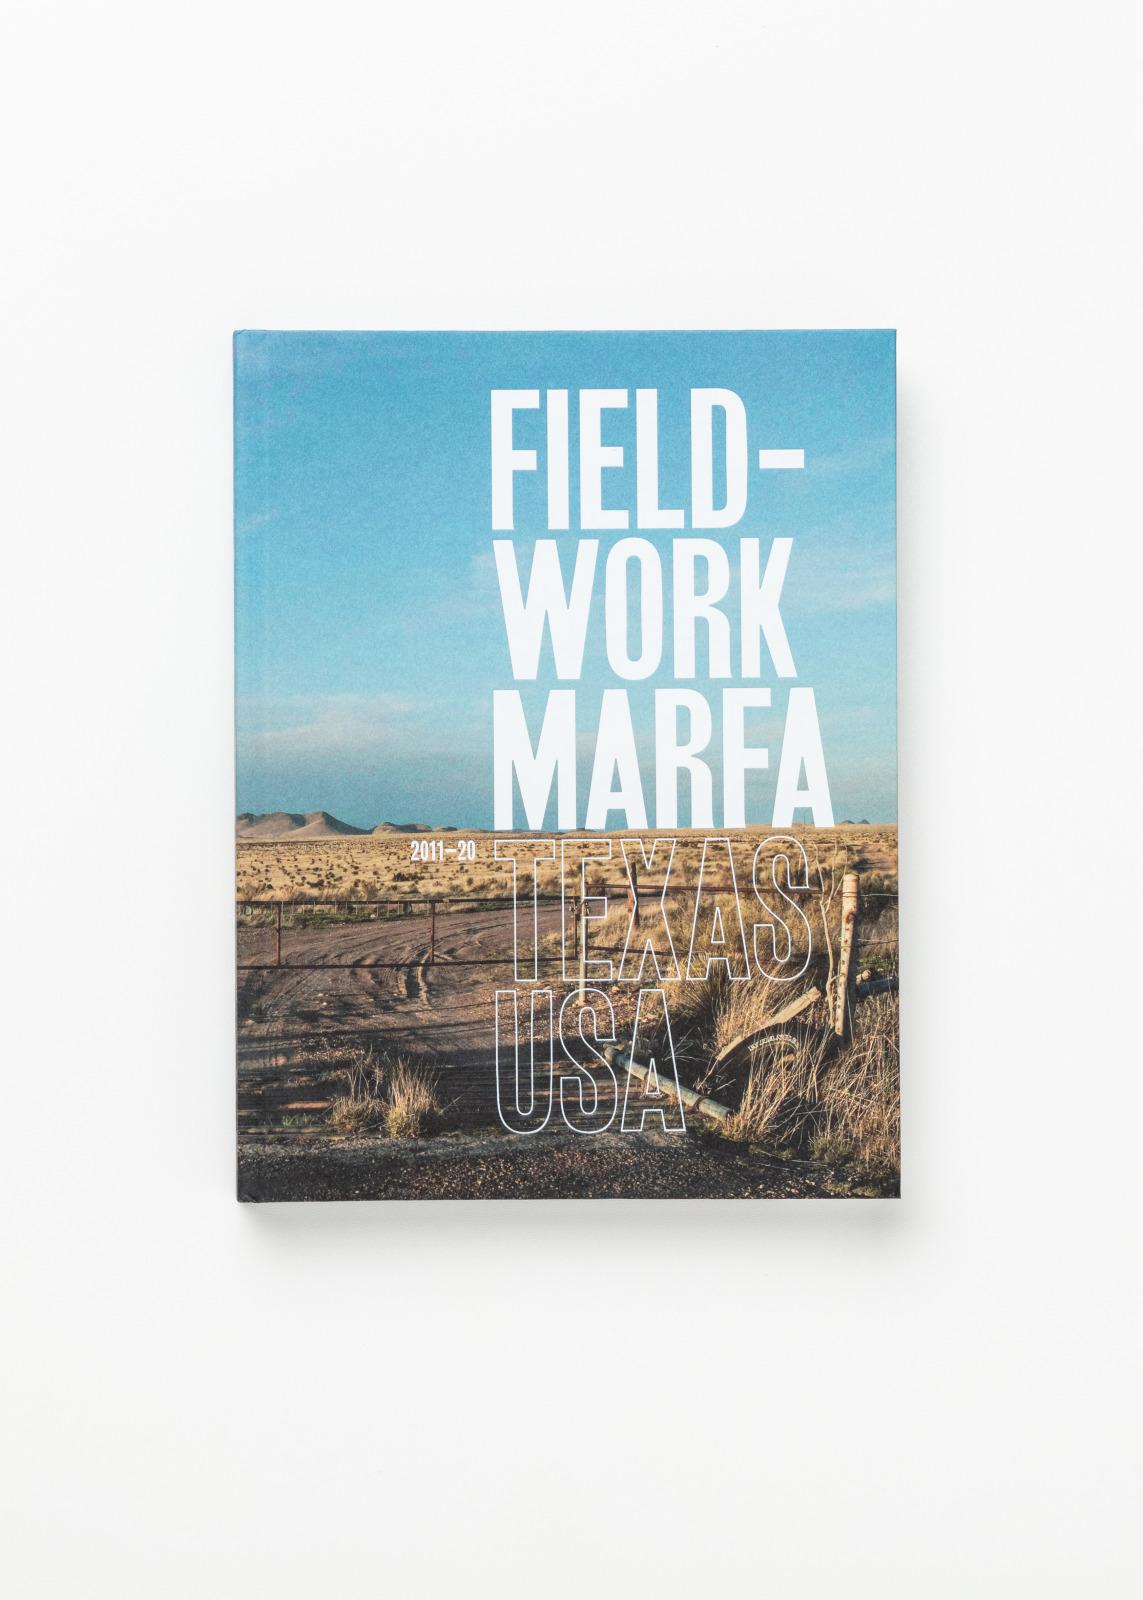 fiel-work marfa  texas usa  2011 – 2020  HEAD-Geneve  Beaux-Arts Nantes